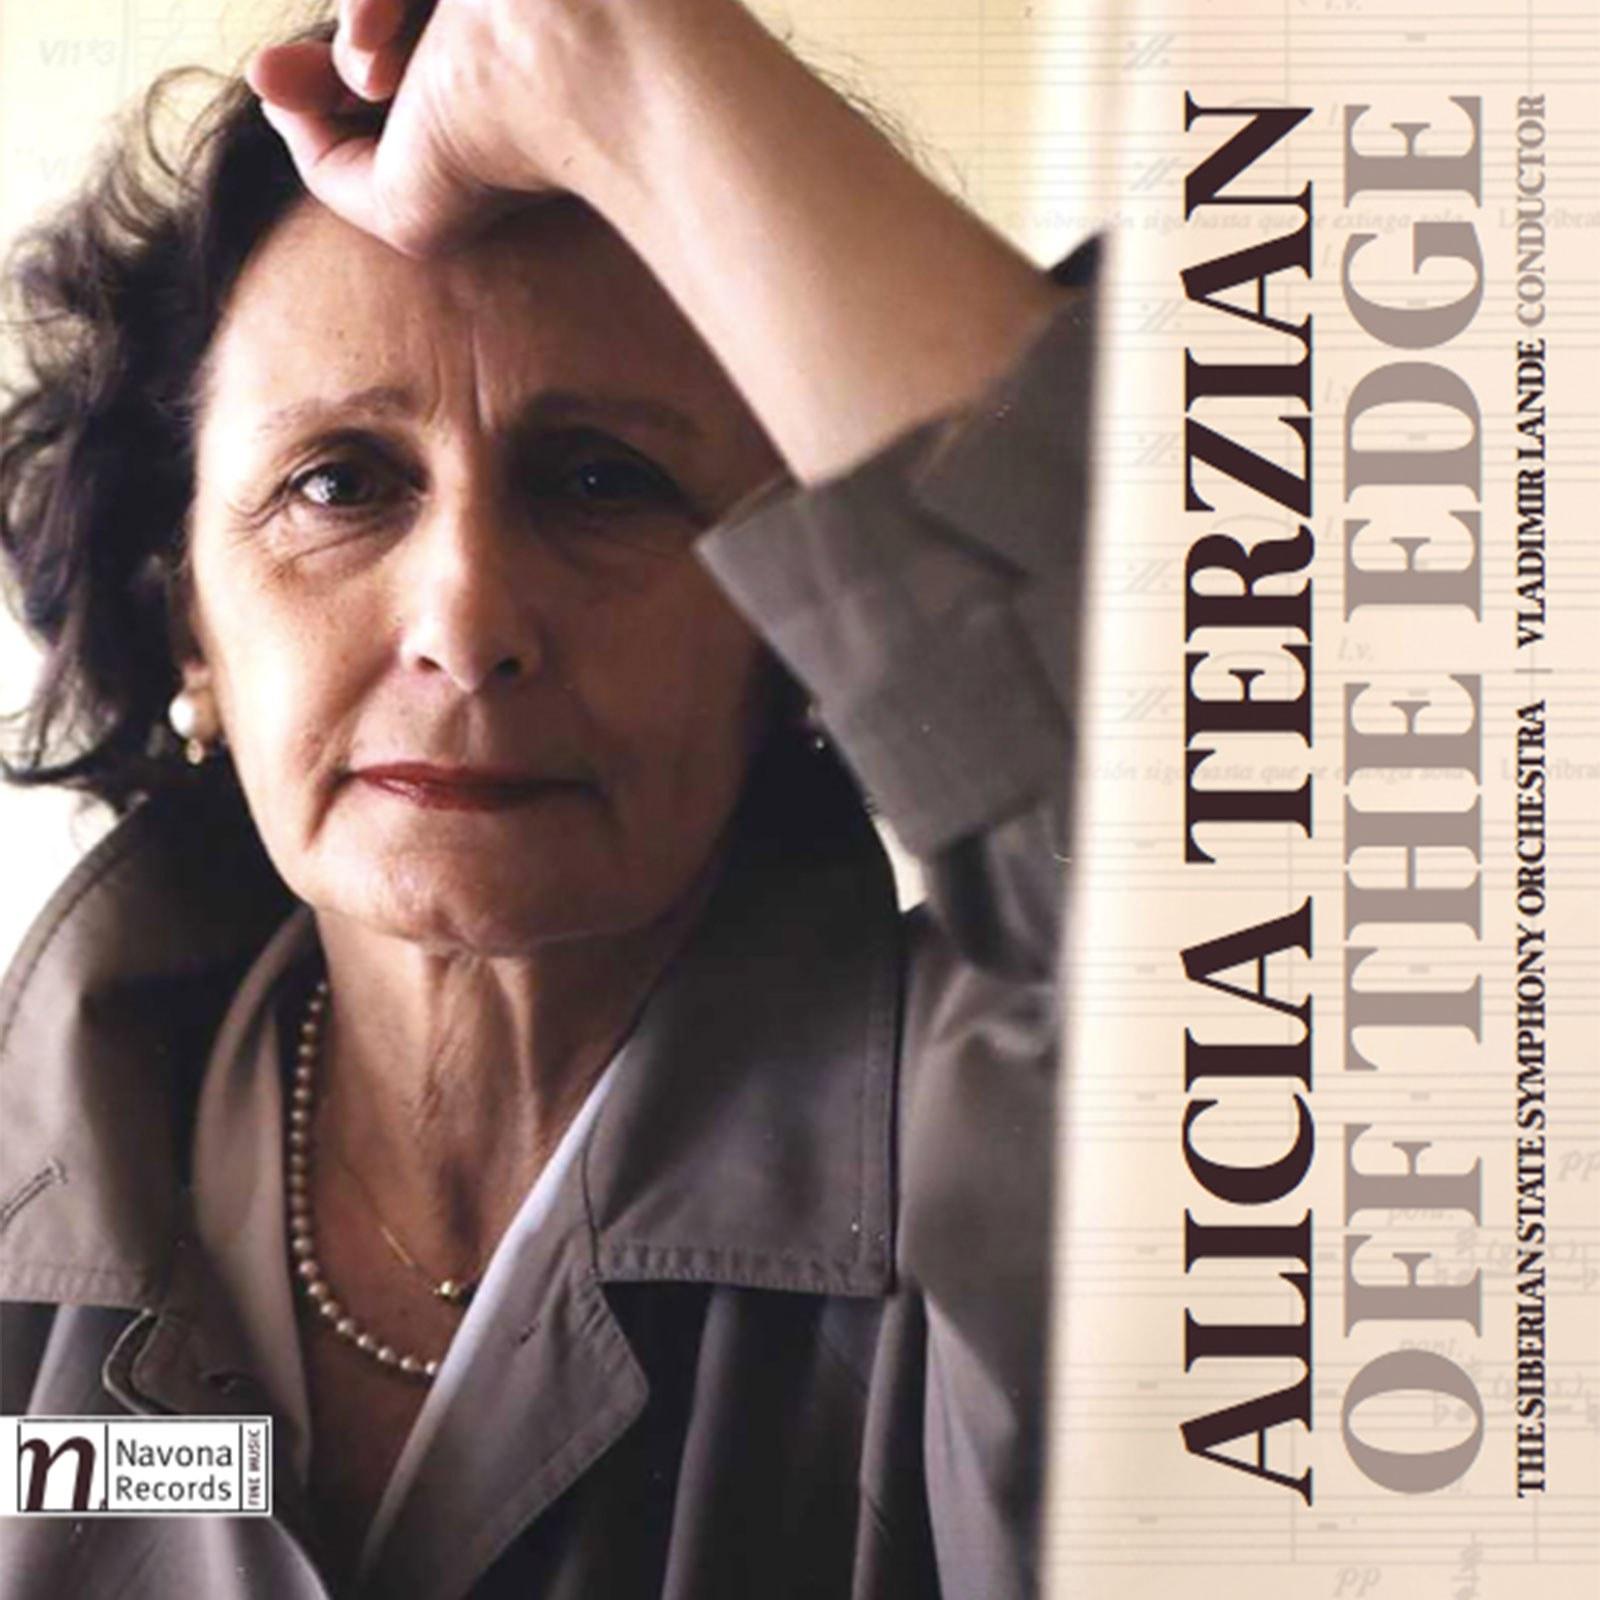 OFF THE EDGE - Alicia Terzian - Album Cover